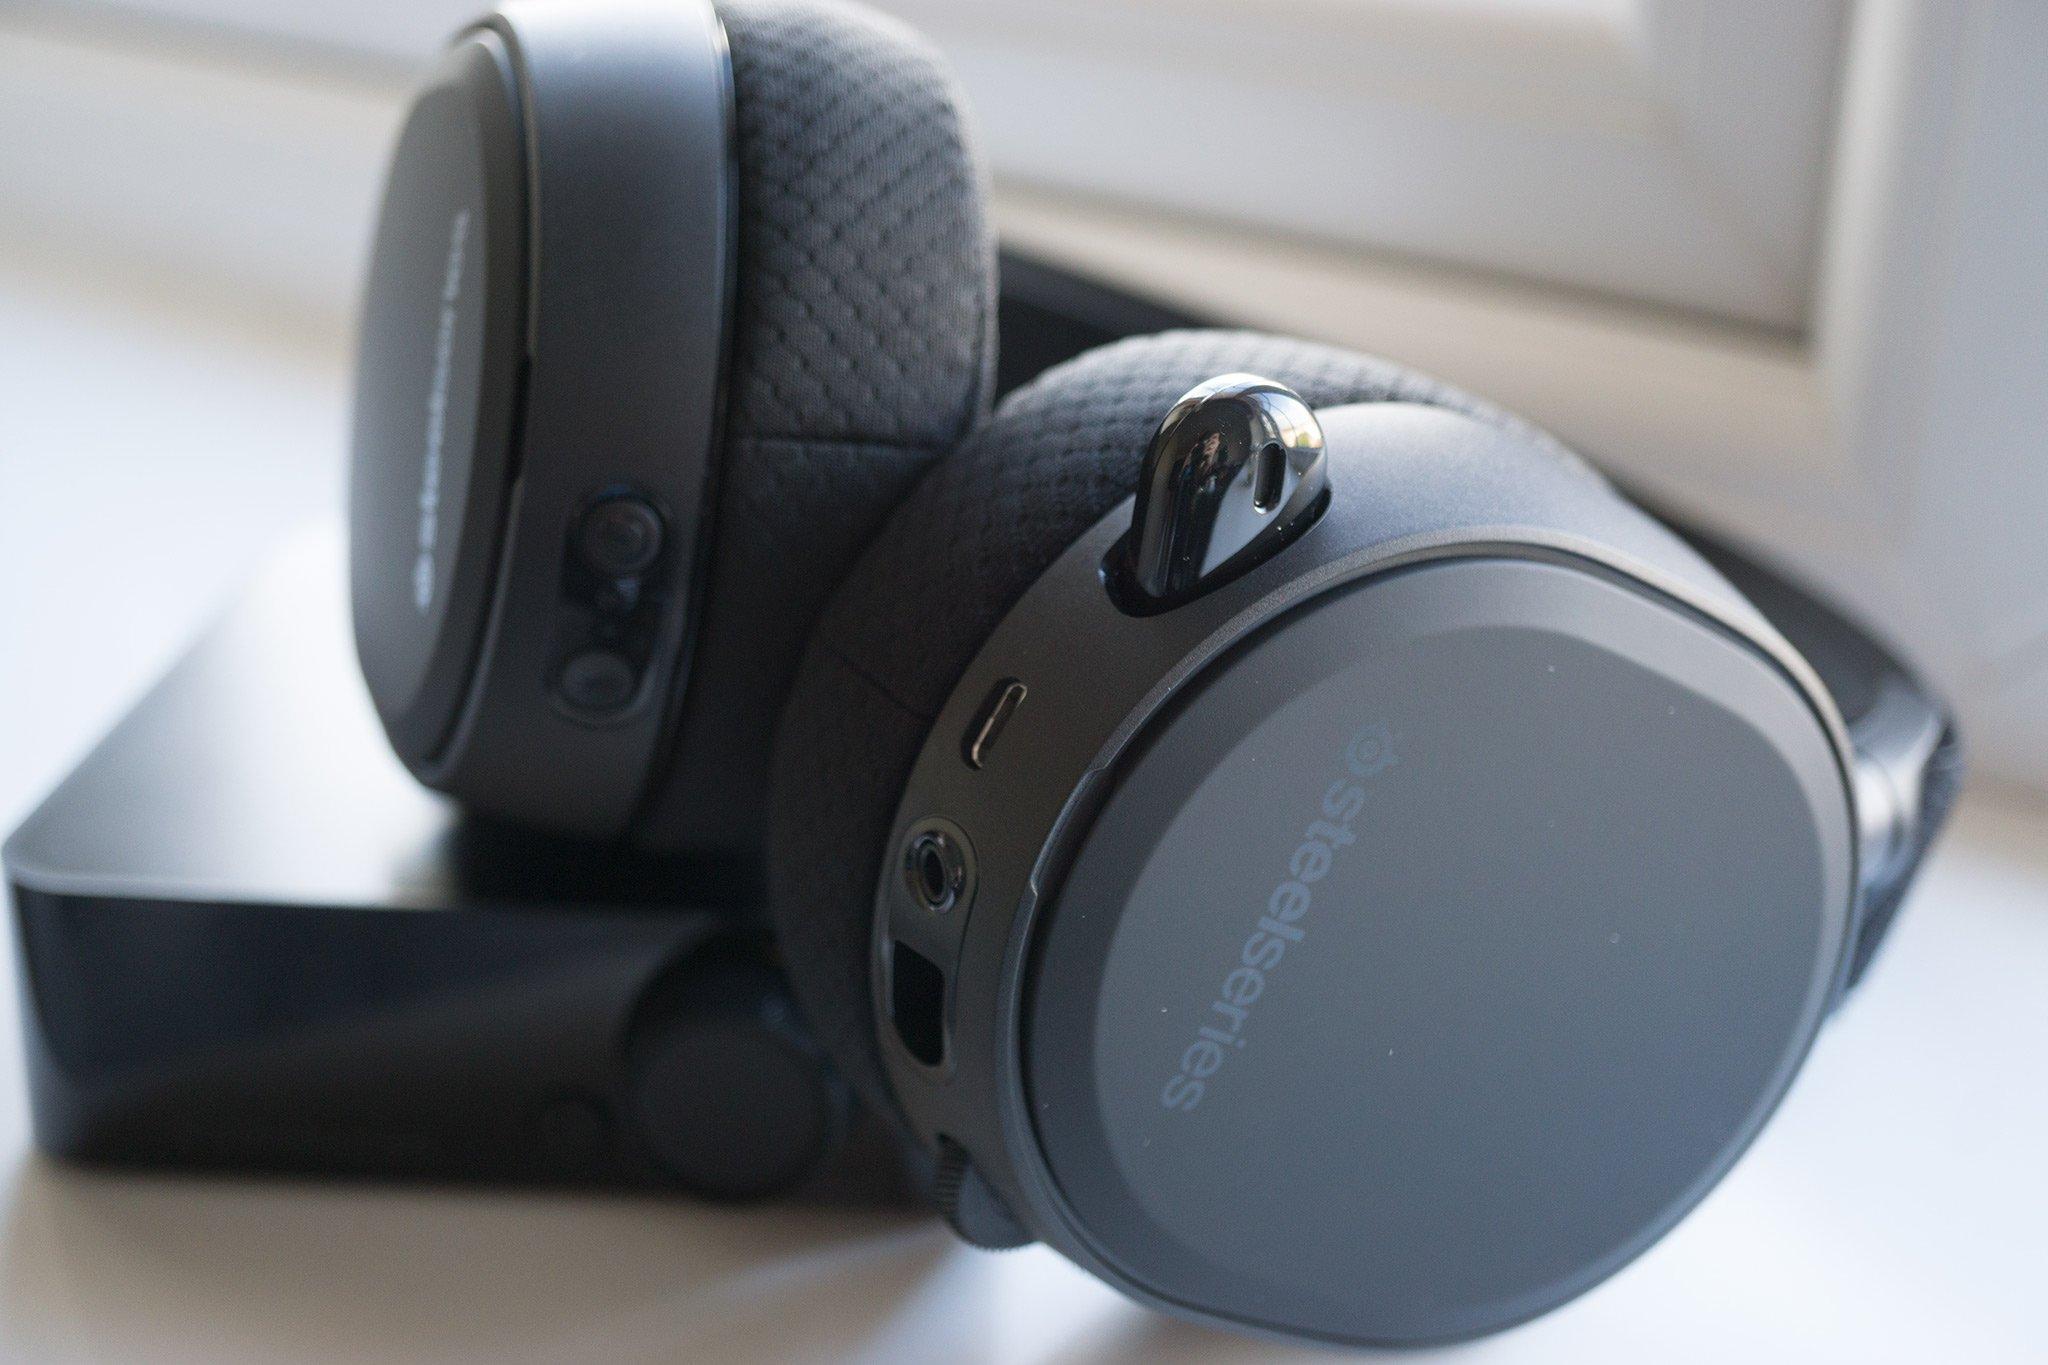 New SteelSeries Arctis Pro Headsets Deliver Supreme